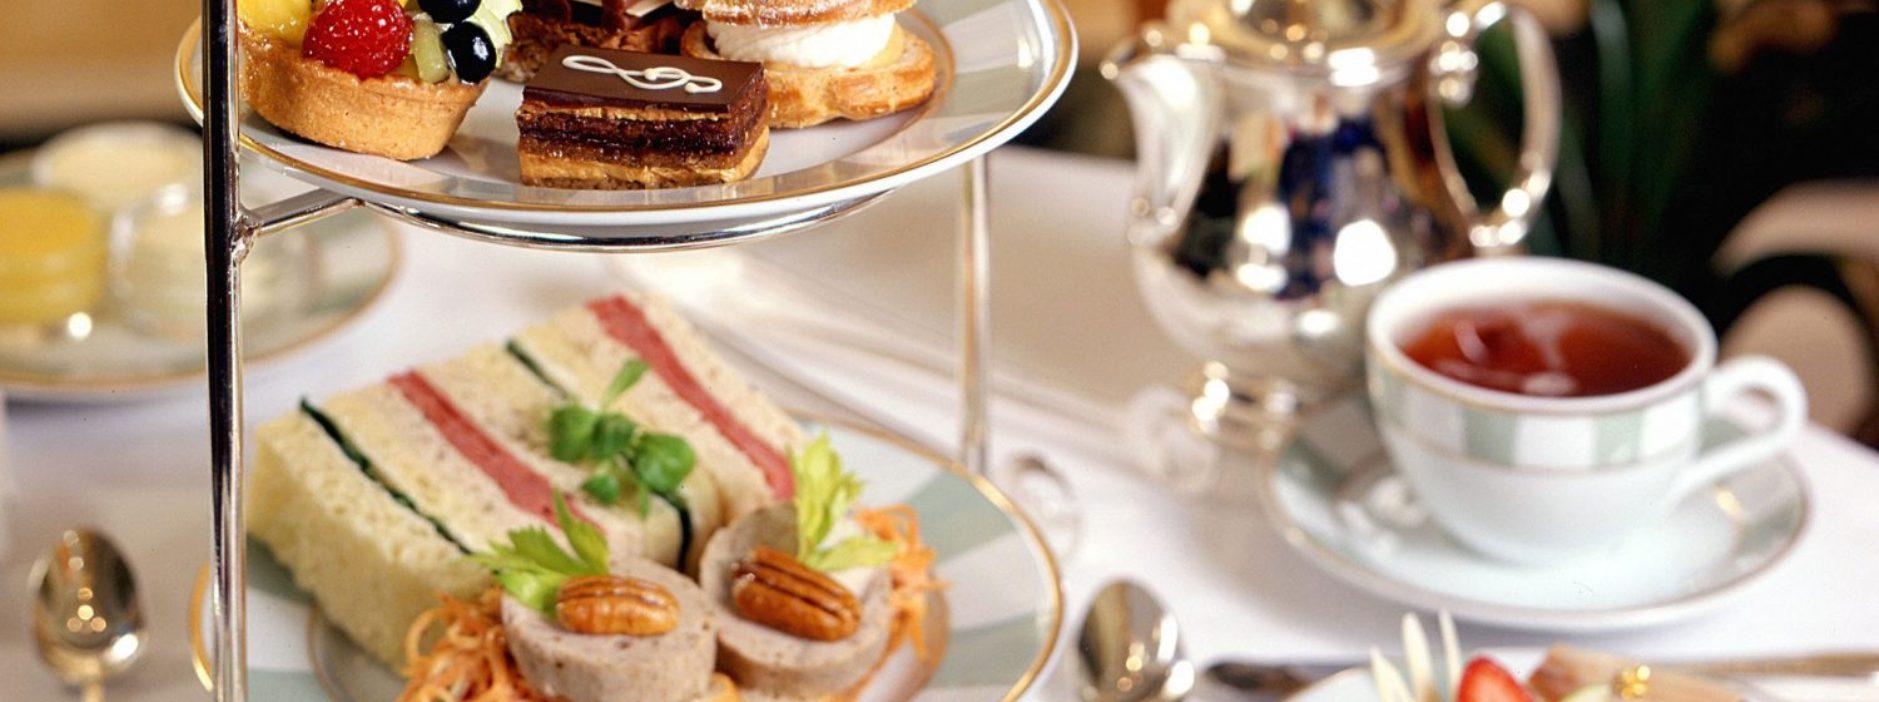 high tea Bush hotel Colereaine